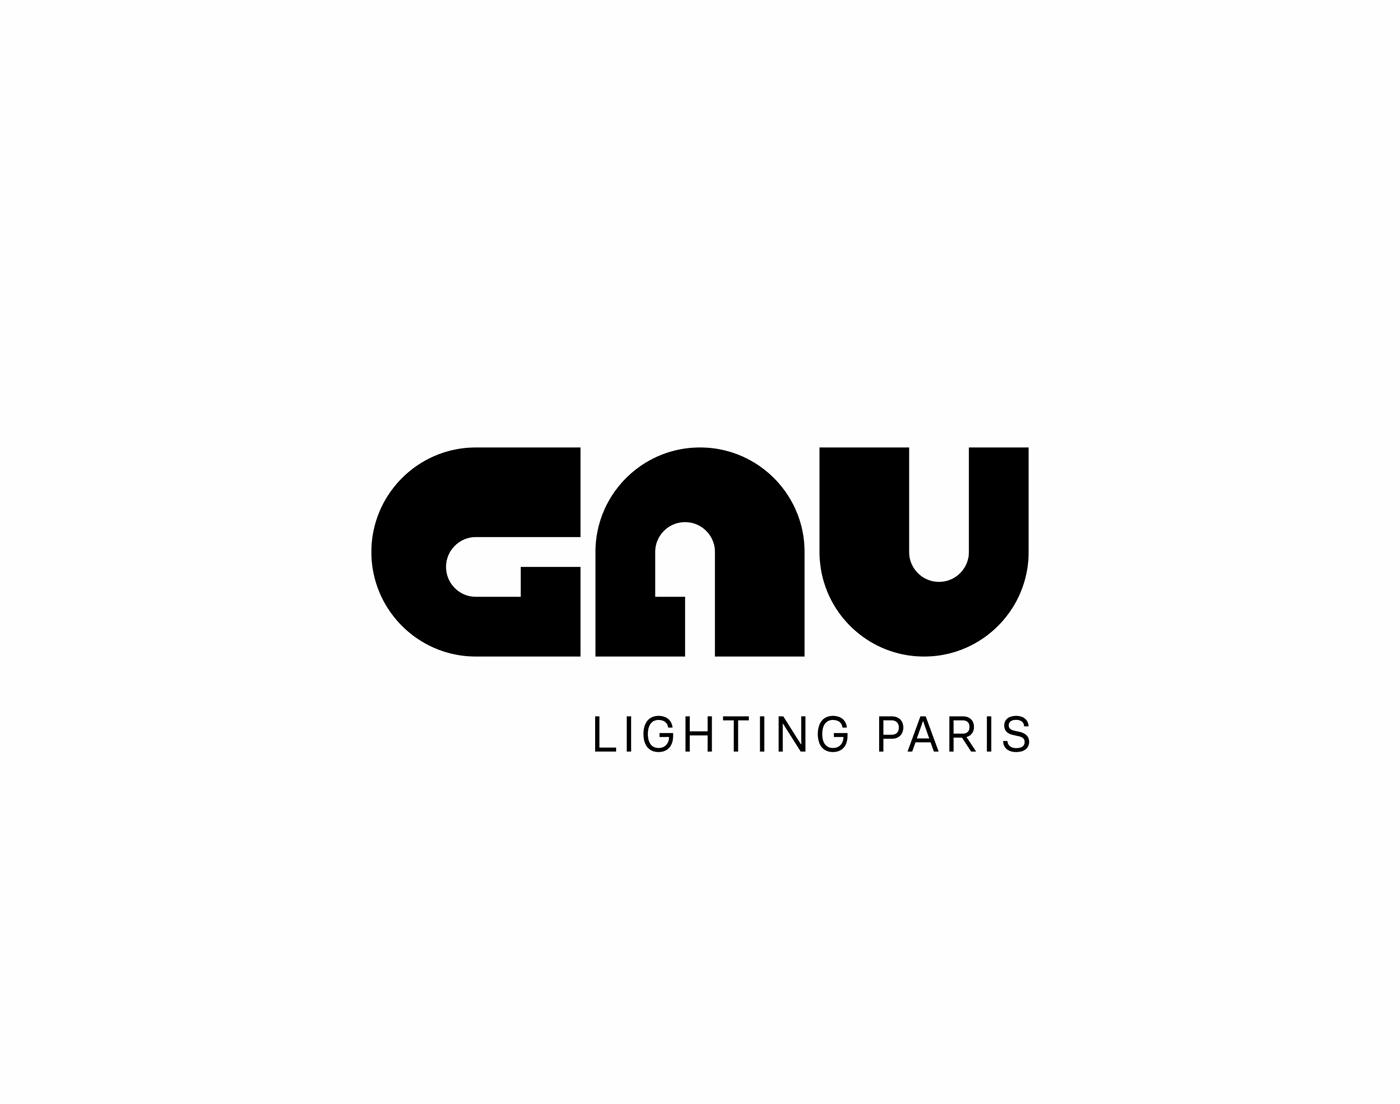 lighting luxury Craftmanship Paris Interior objects